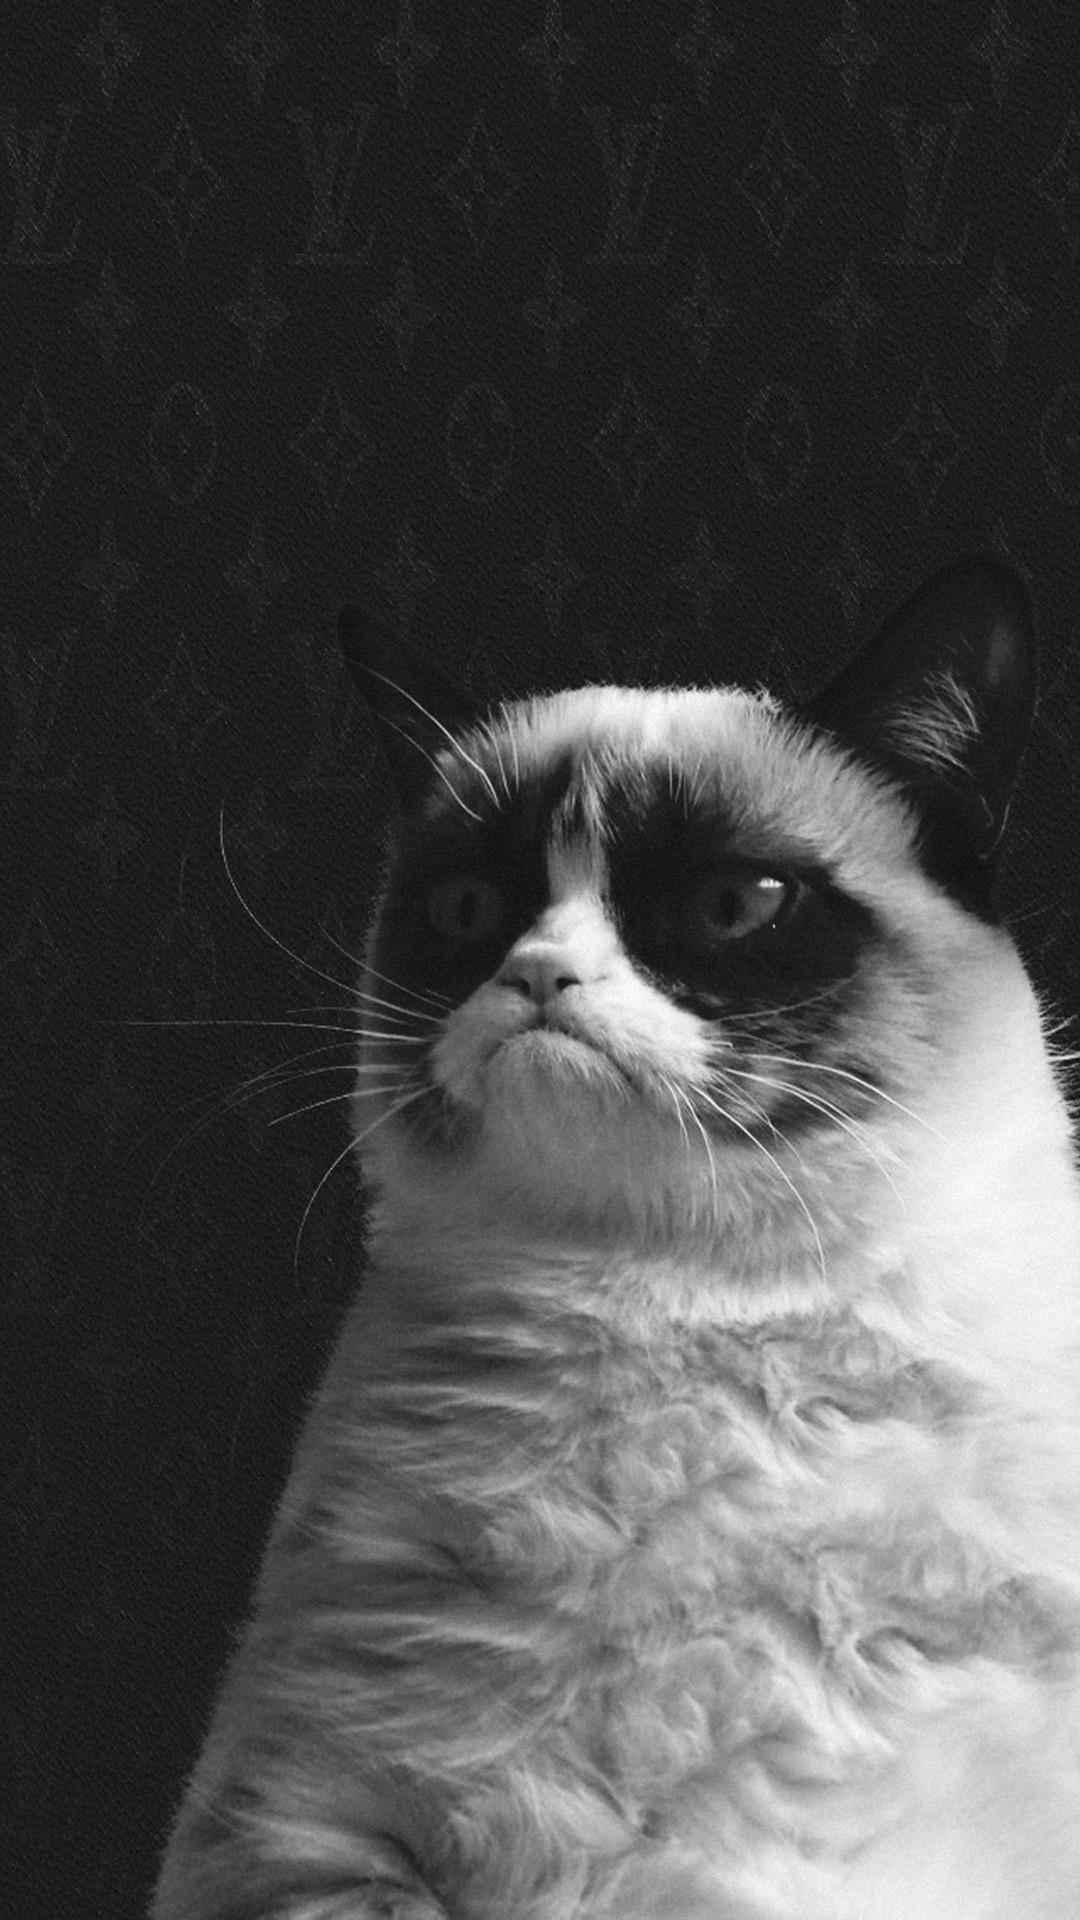 Res: 1080x1920, Cool Zvn:851 - Grumpy Cat Wallpapers, Magnificent Grumpy Cat Hd with Cat  Wallpaper